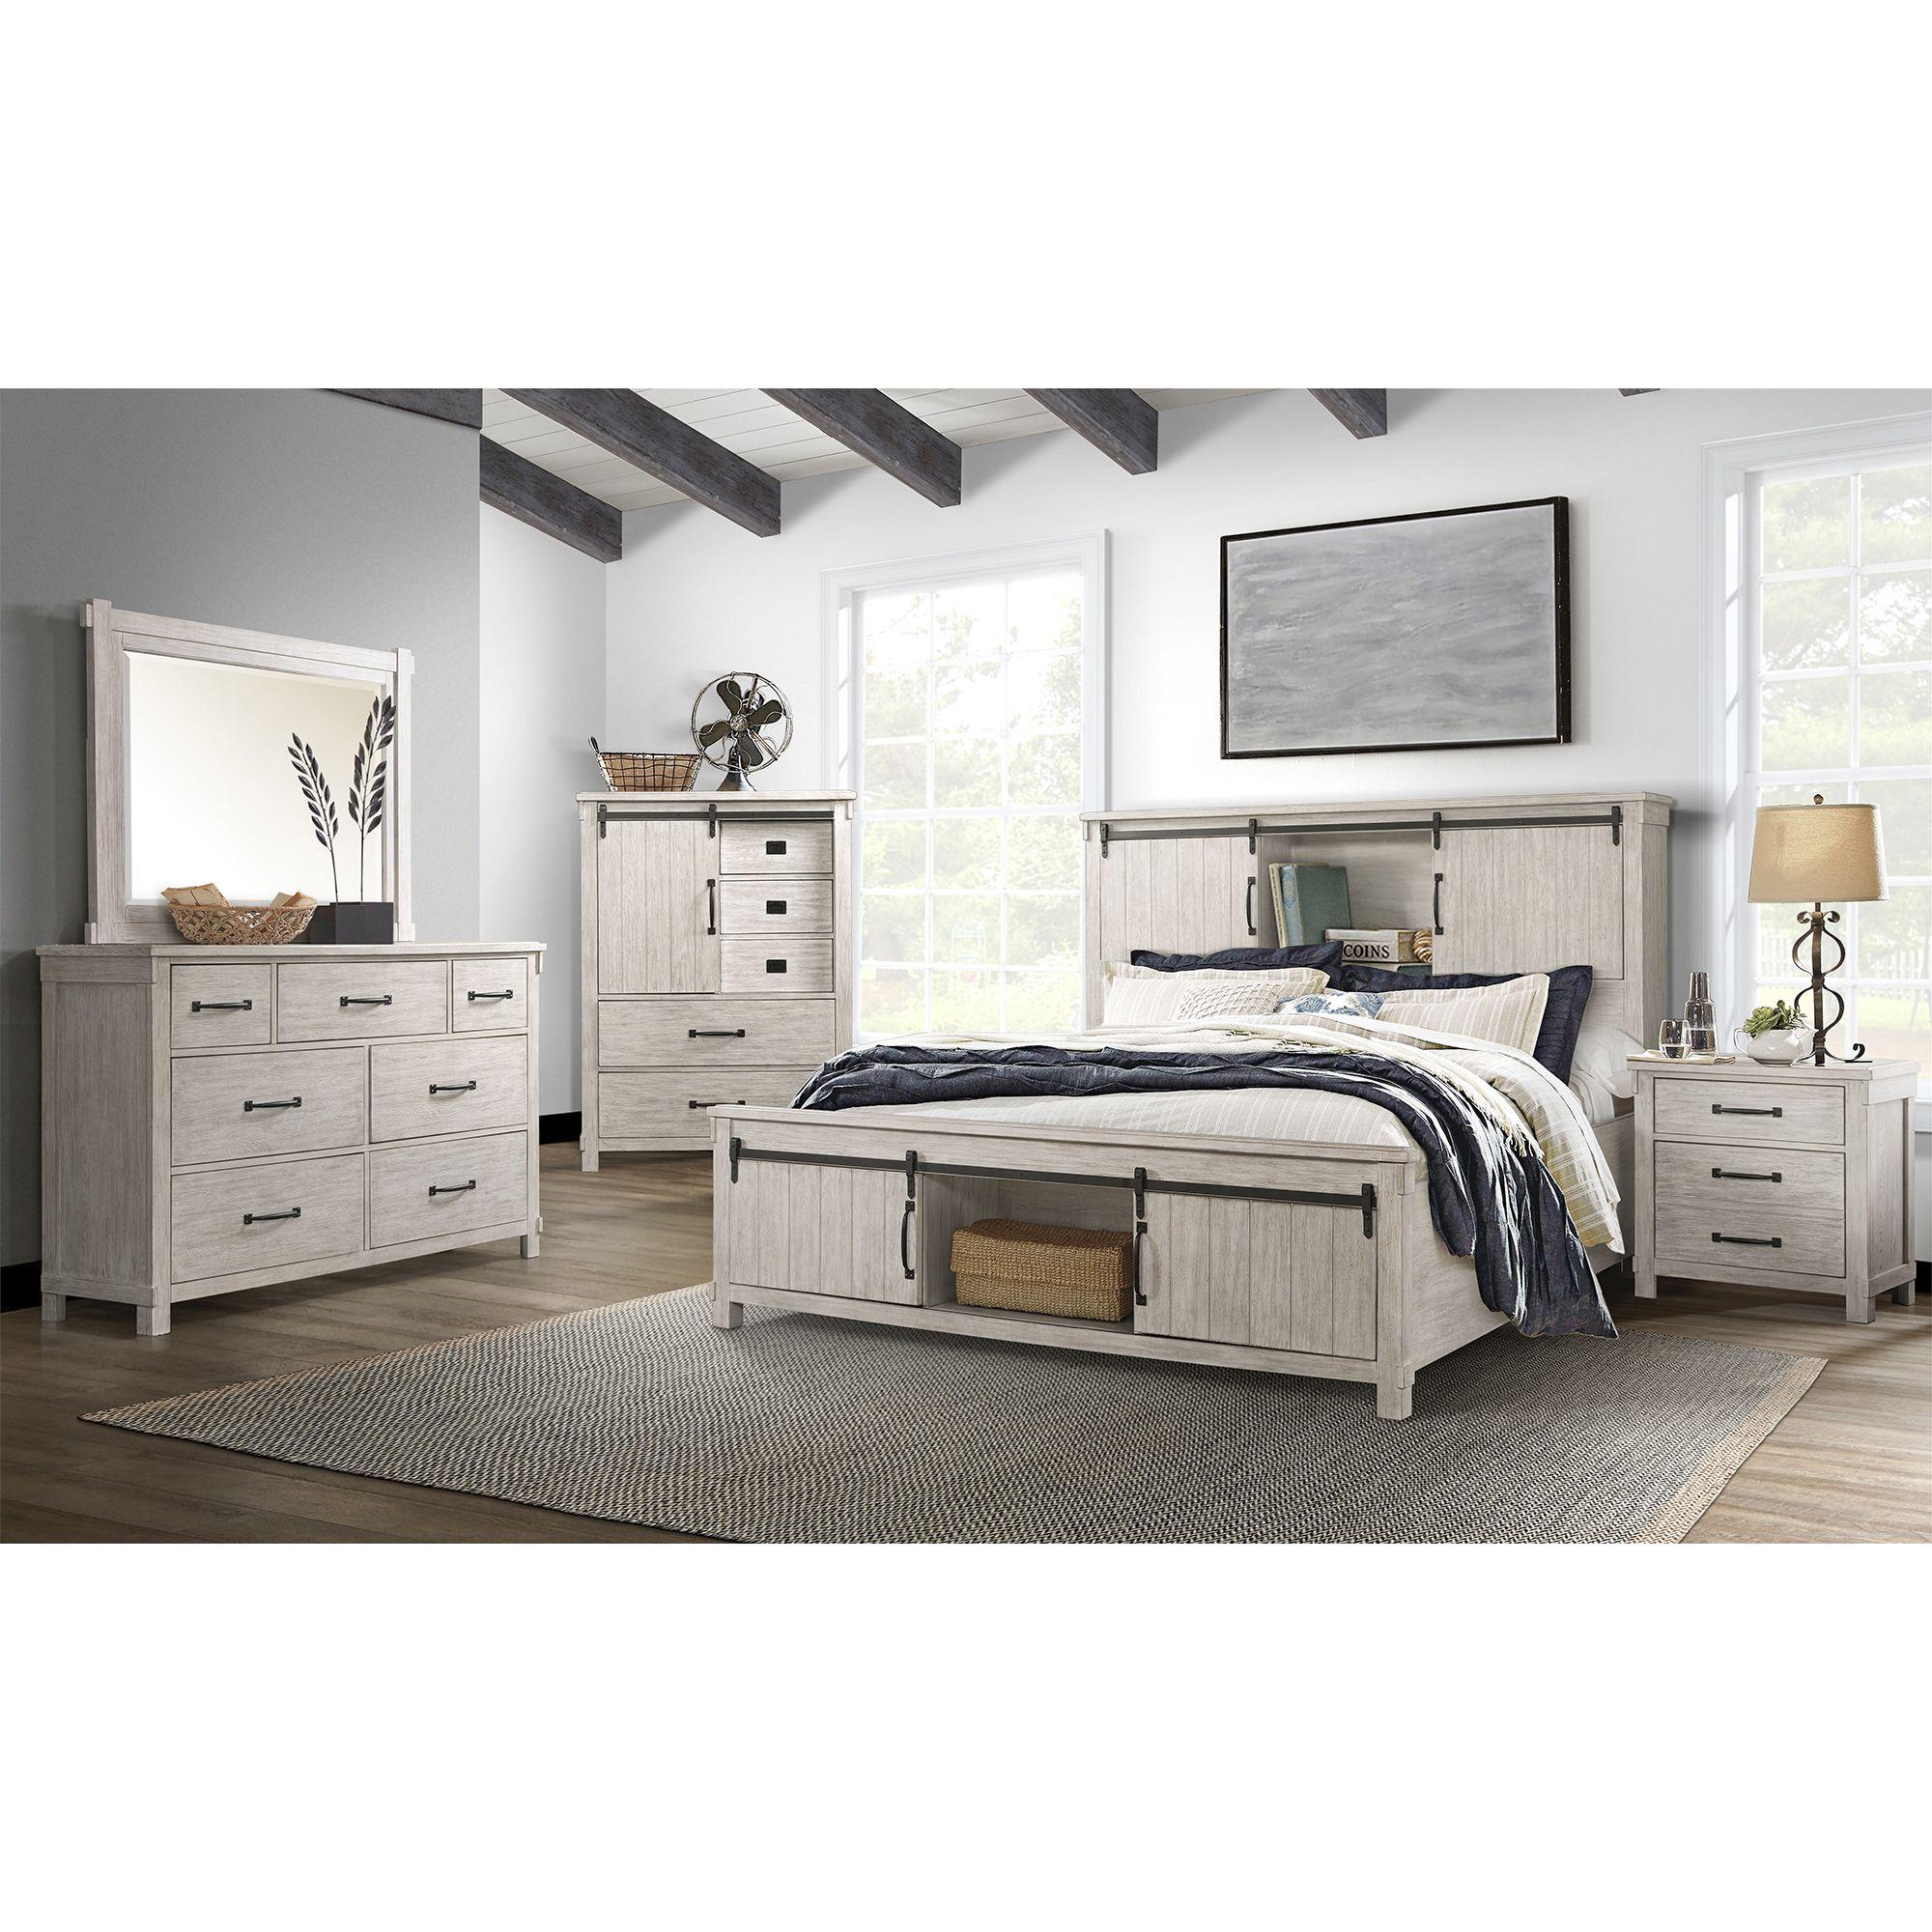 Picture of: Picket House Furnishings Jack Queen Platform Storage 5 Piece Bedroom Set Bjs Wholesale Club